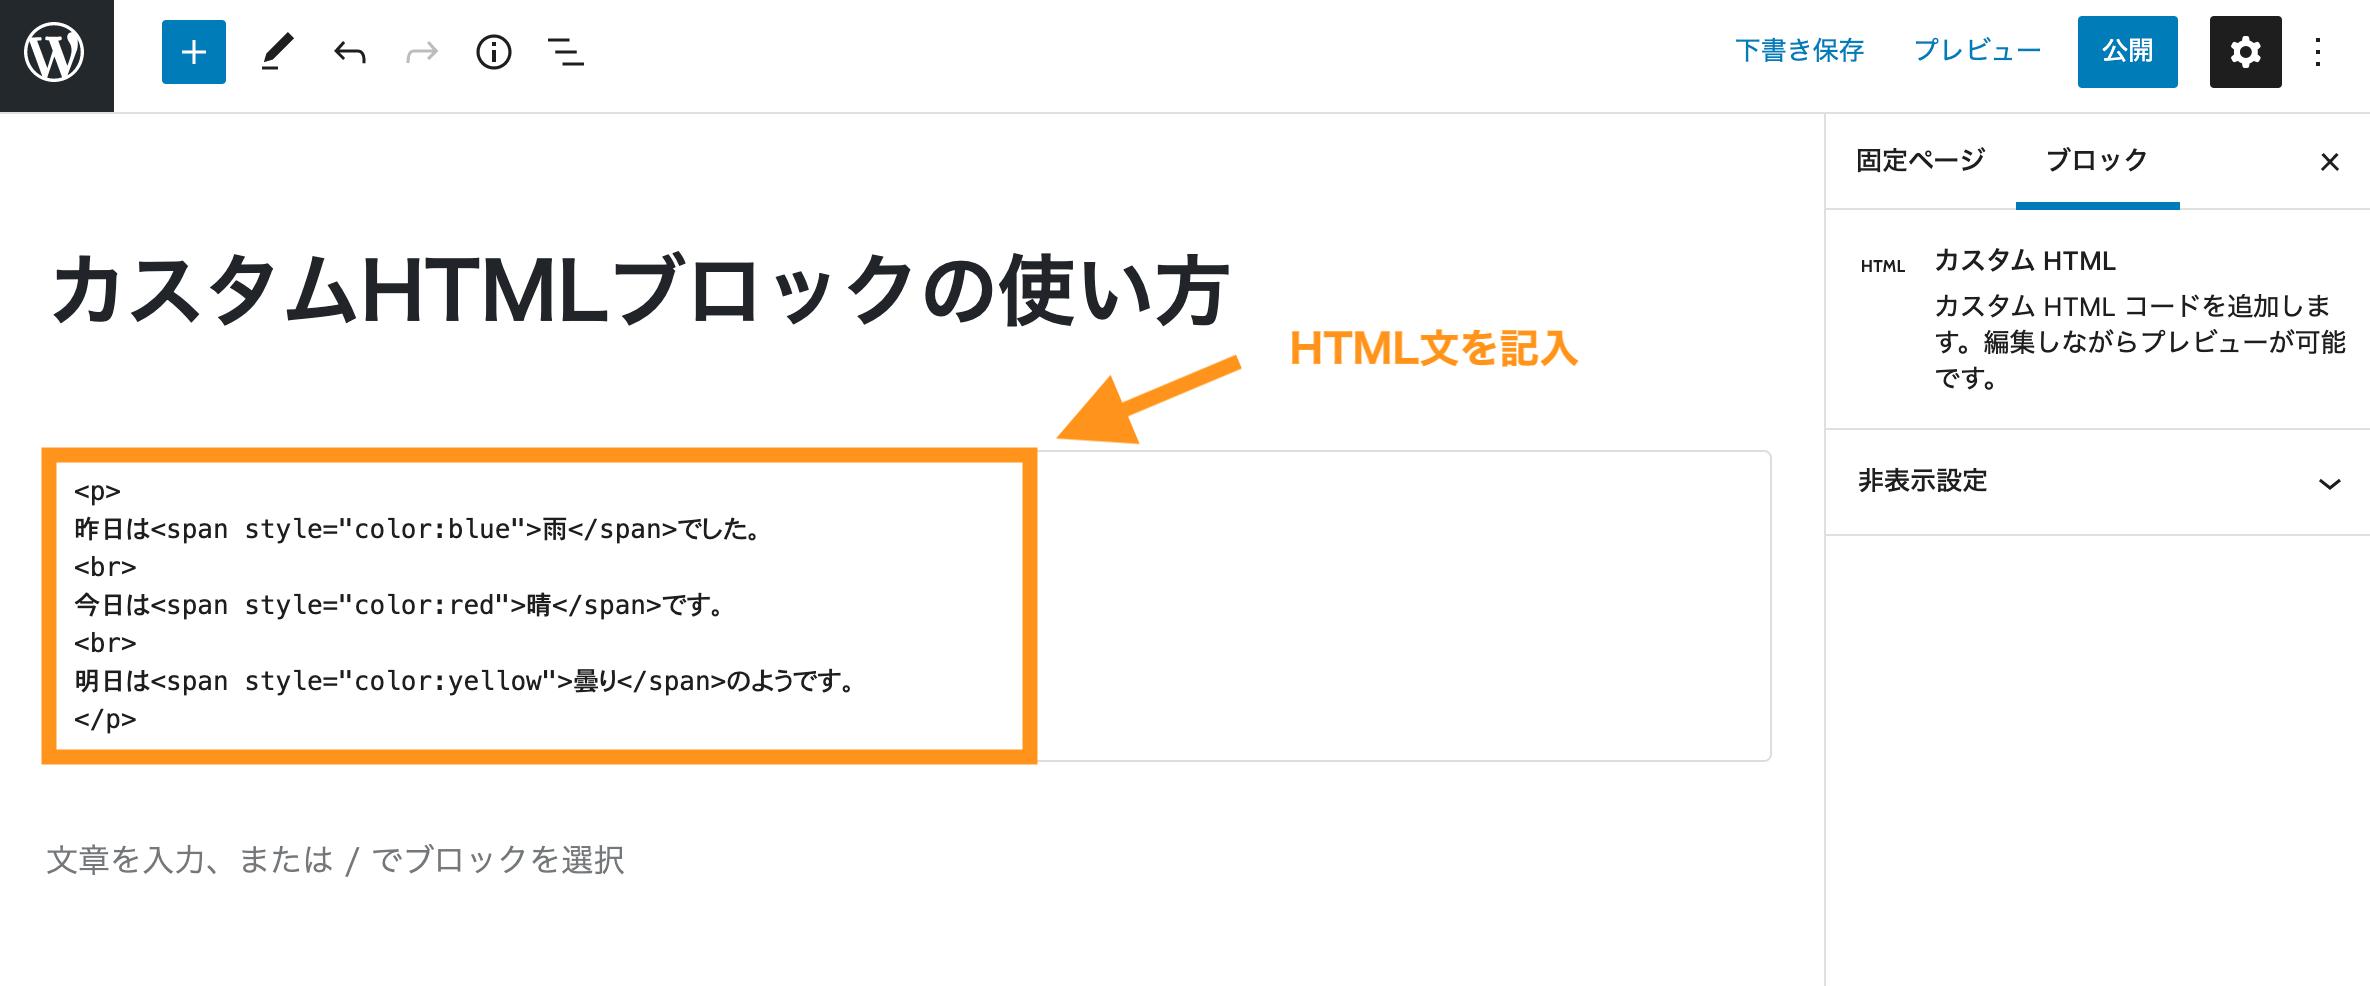 HTMLコードを入力した例